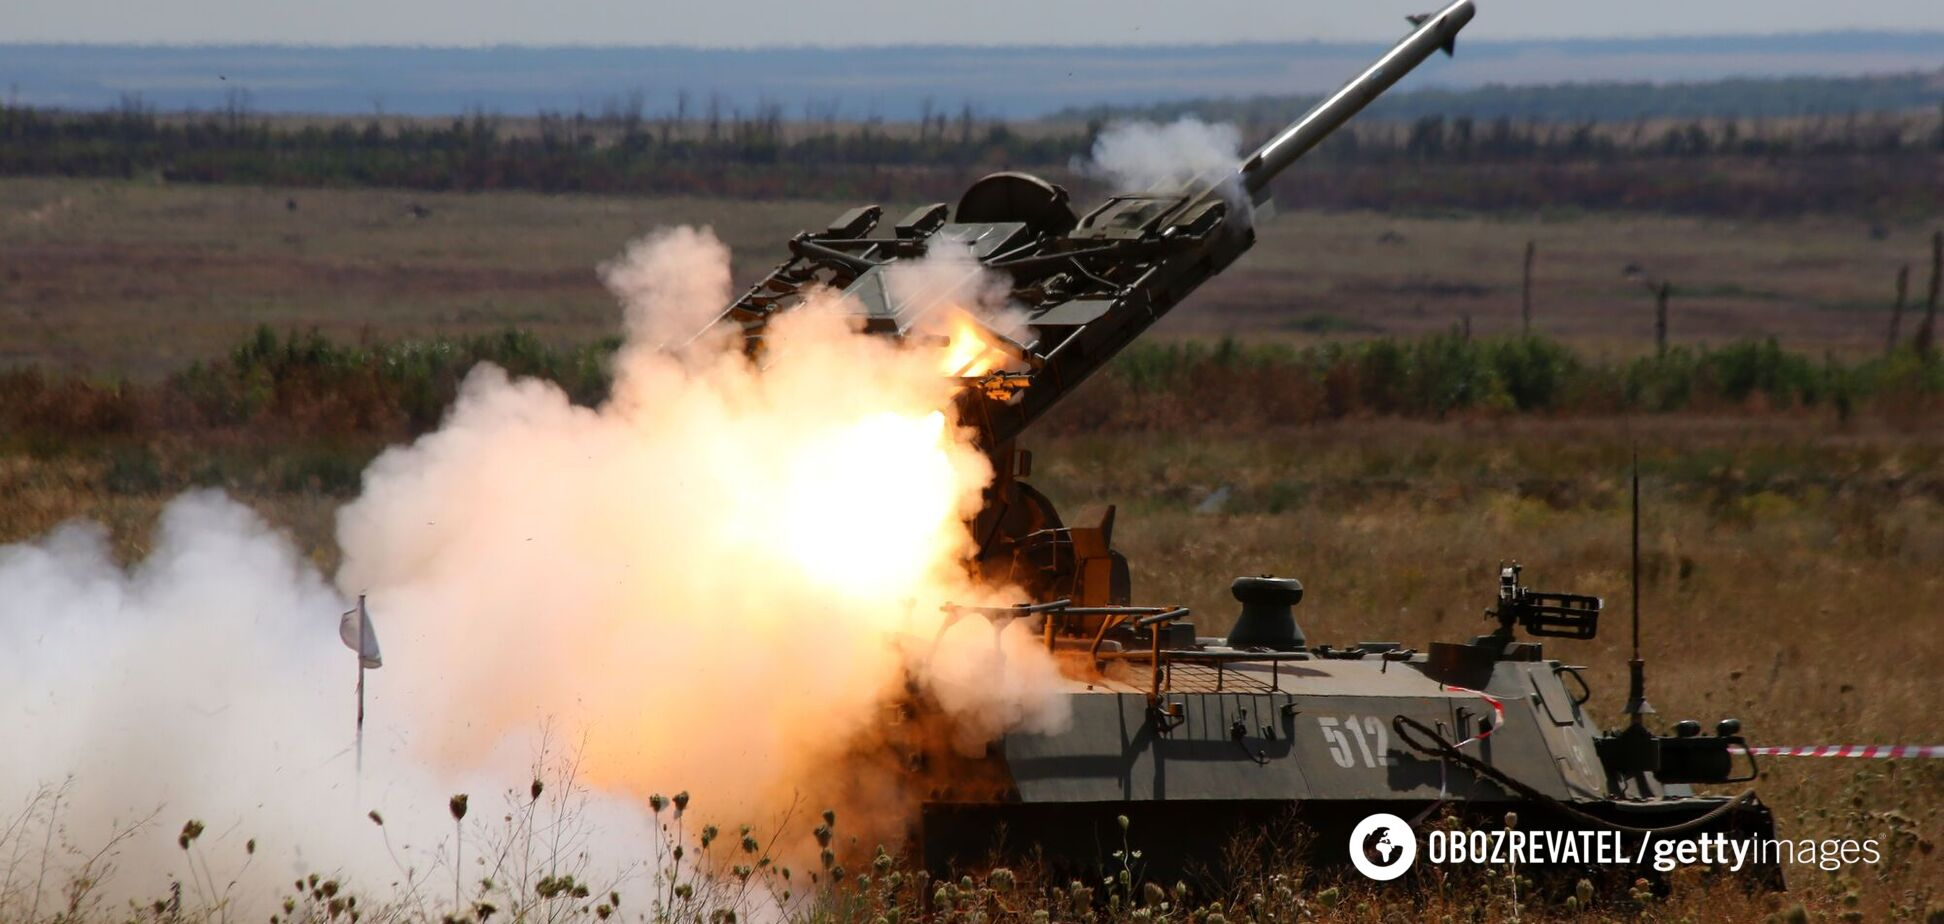 Окупанти обстріляли ЗСУ з ракетного комплексу, один воїн загинув